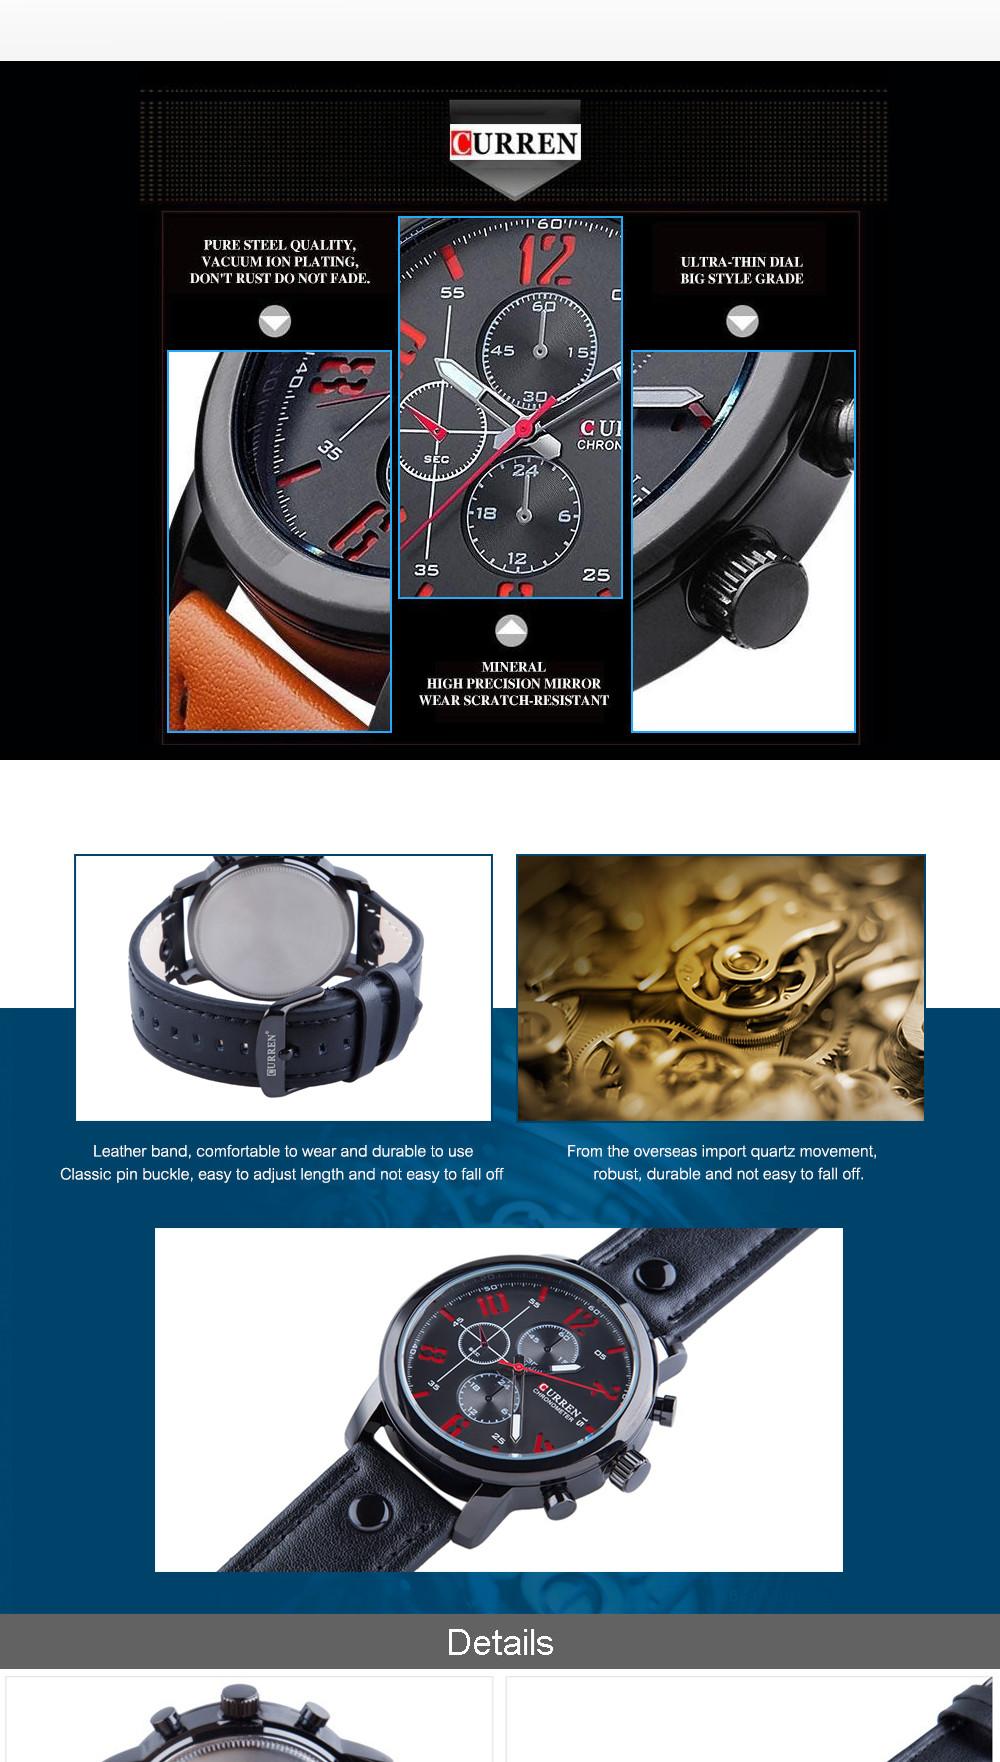 2016 CURREN Guys Watches Luxury Informal Guys Watches Analog Defense force Activities Watch Quartz Male Wristwatches Relogio Masculino (4)